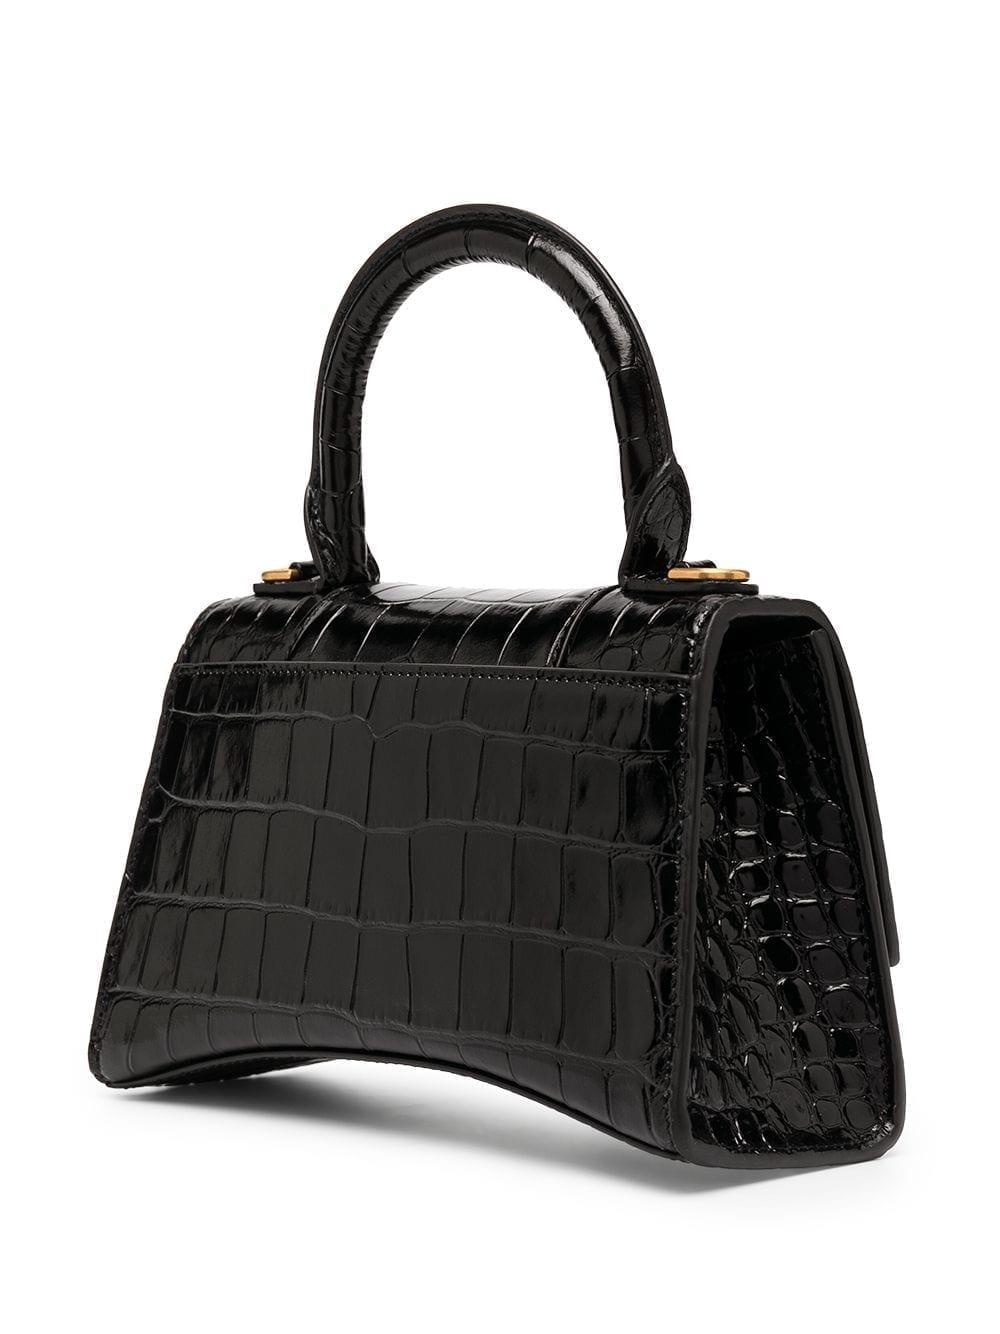 BALENCIAGA Crocodile Effect Tote Bag